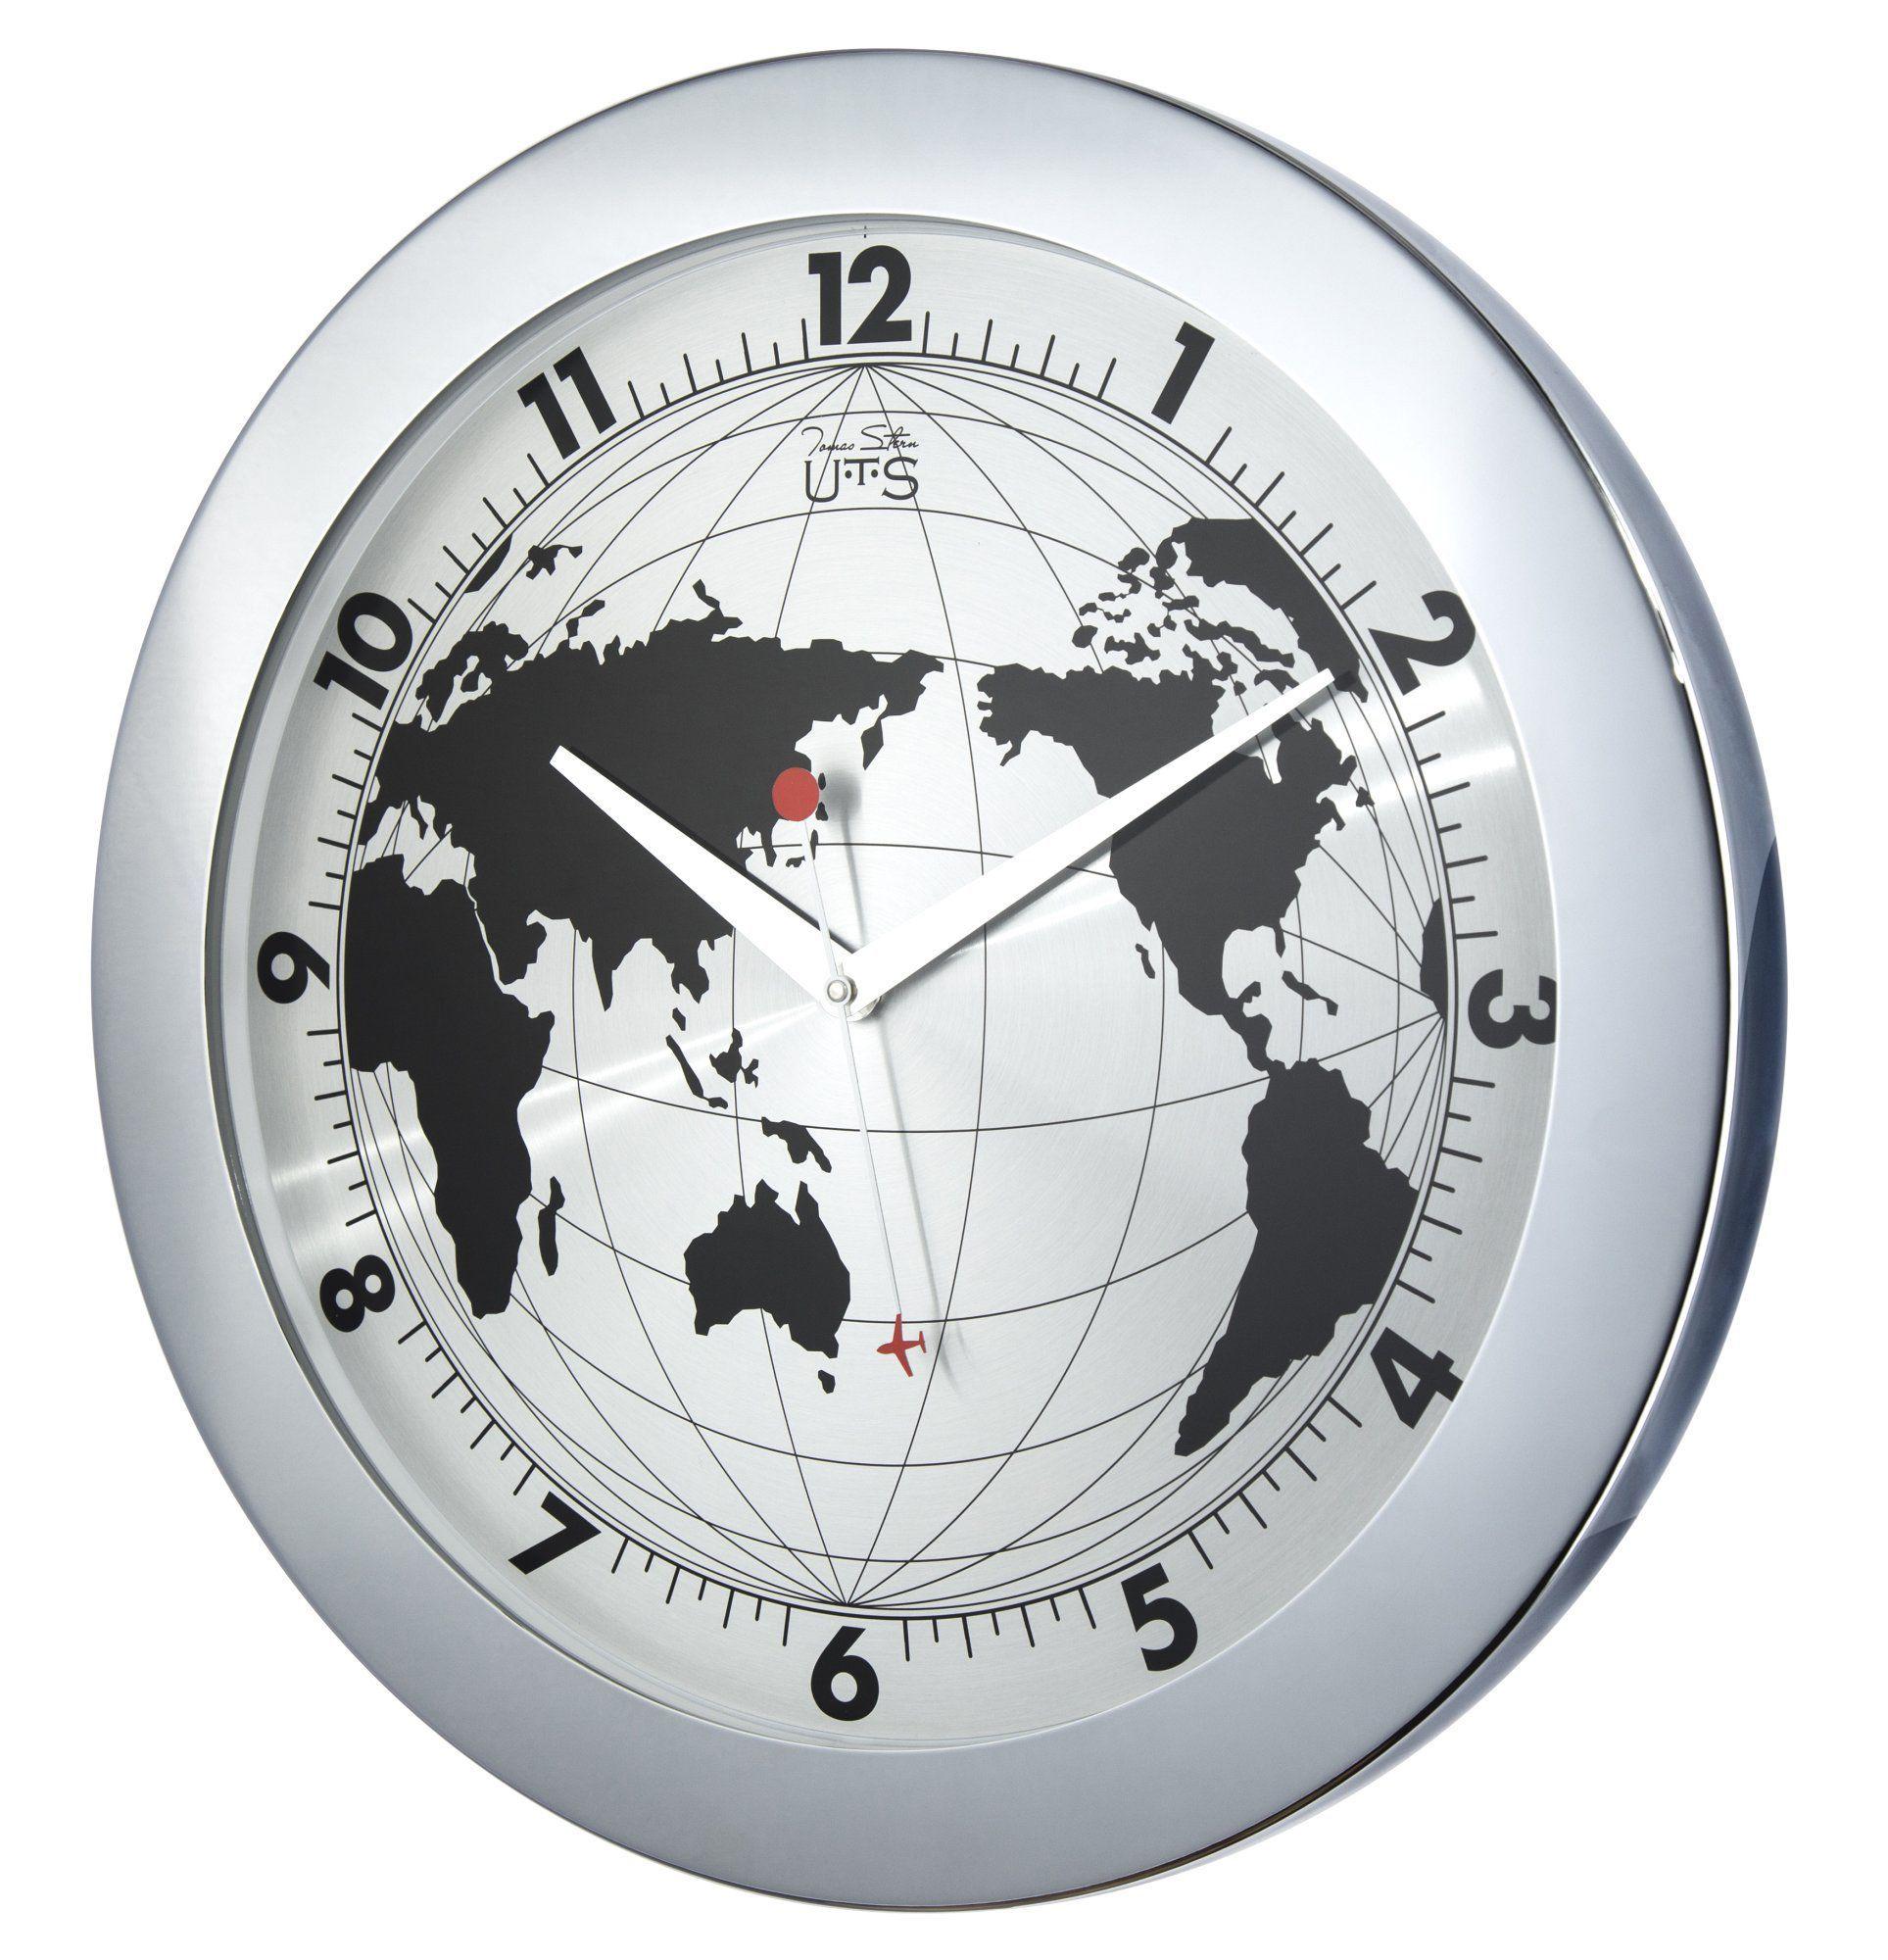 Часы настенные Часы настенные Tomas Stern 4001S chasy-nastennye-tomas-stern-4001s-germaniya-tayvan.jpg